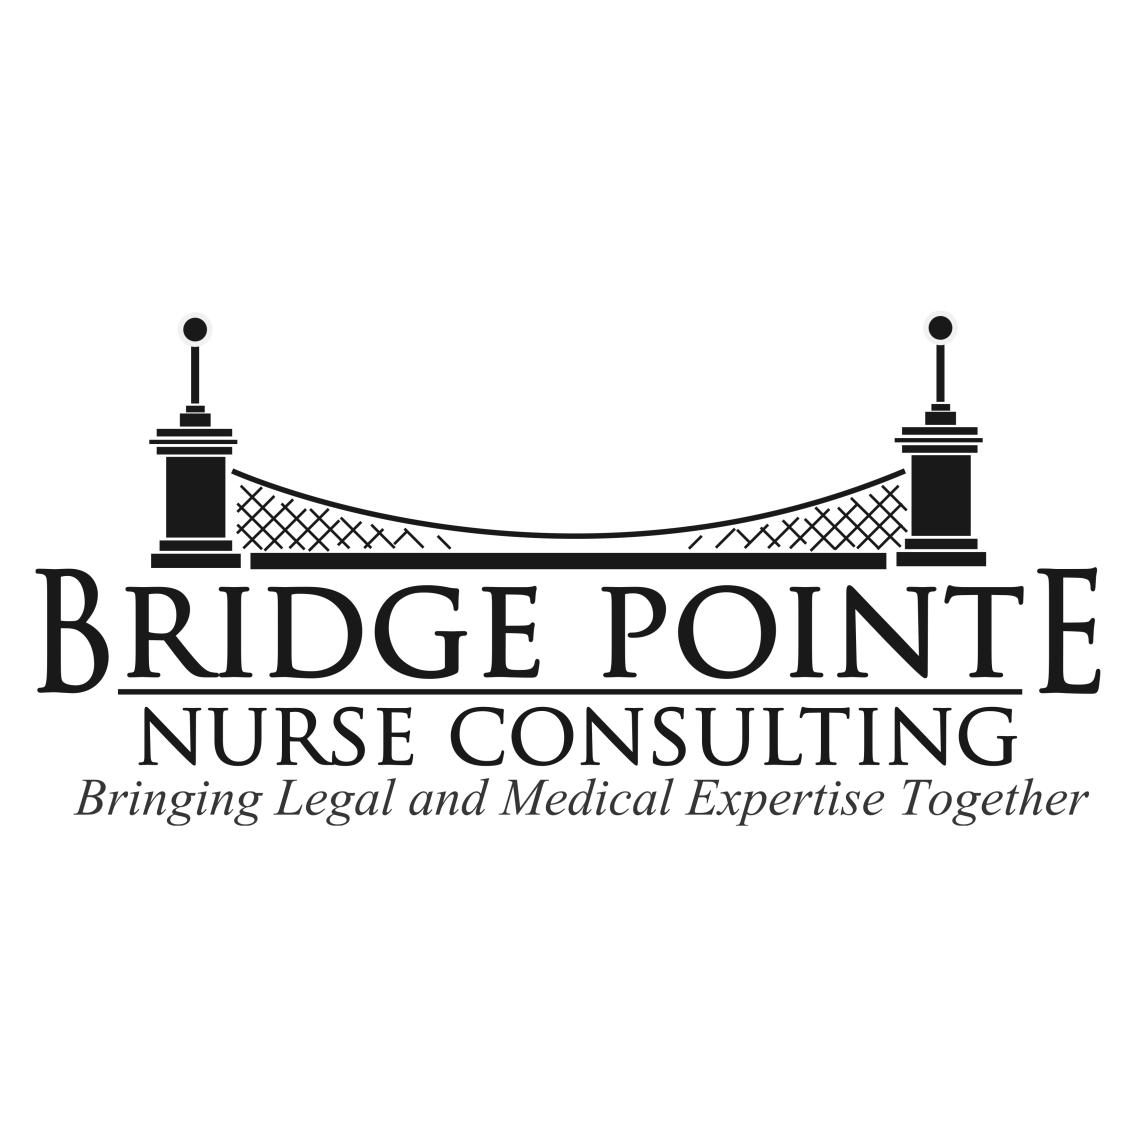 Bridge Pointe Nurse Consulting